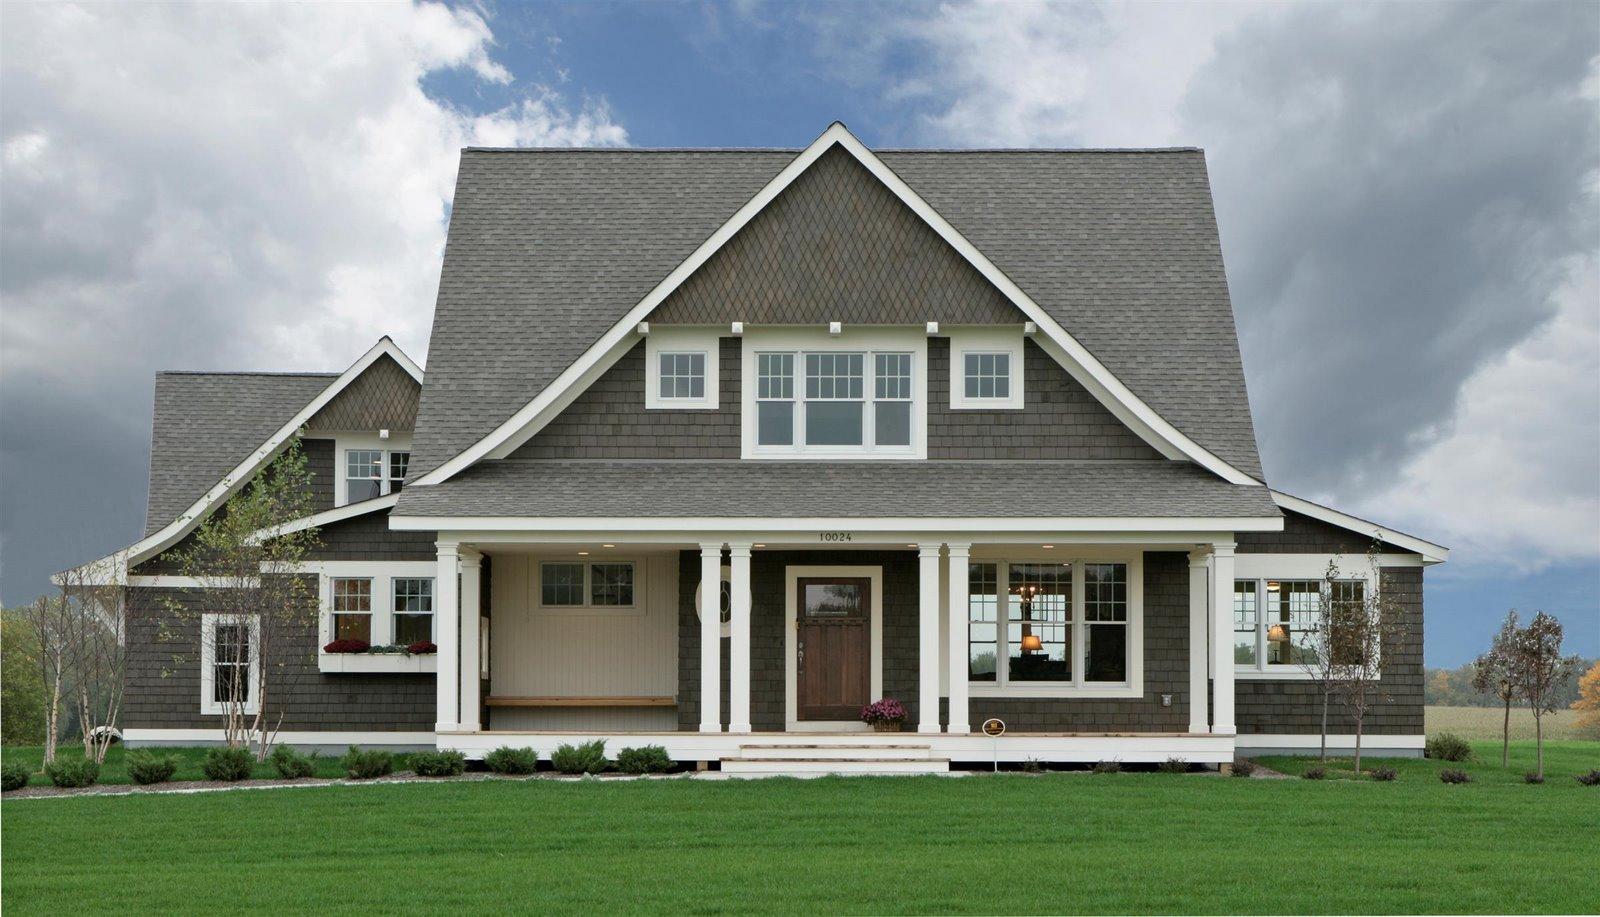 Cape Cod Style House Design